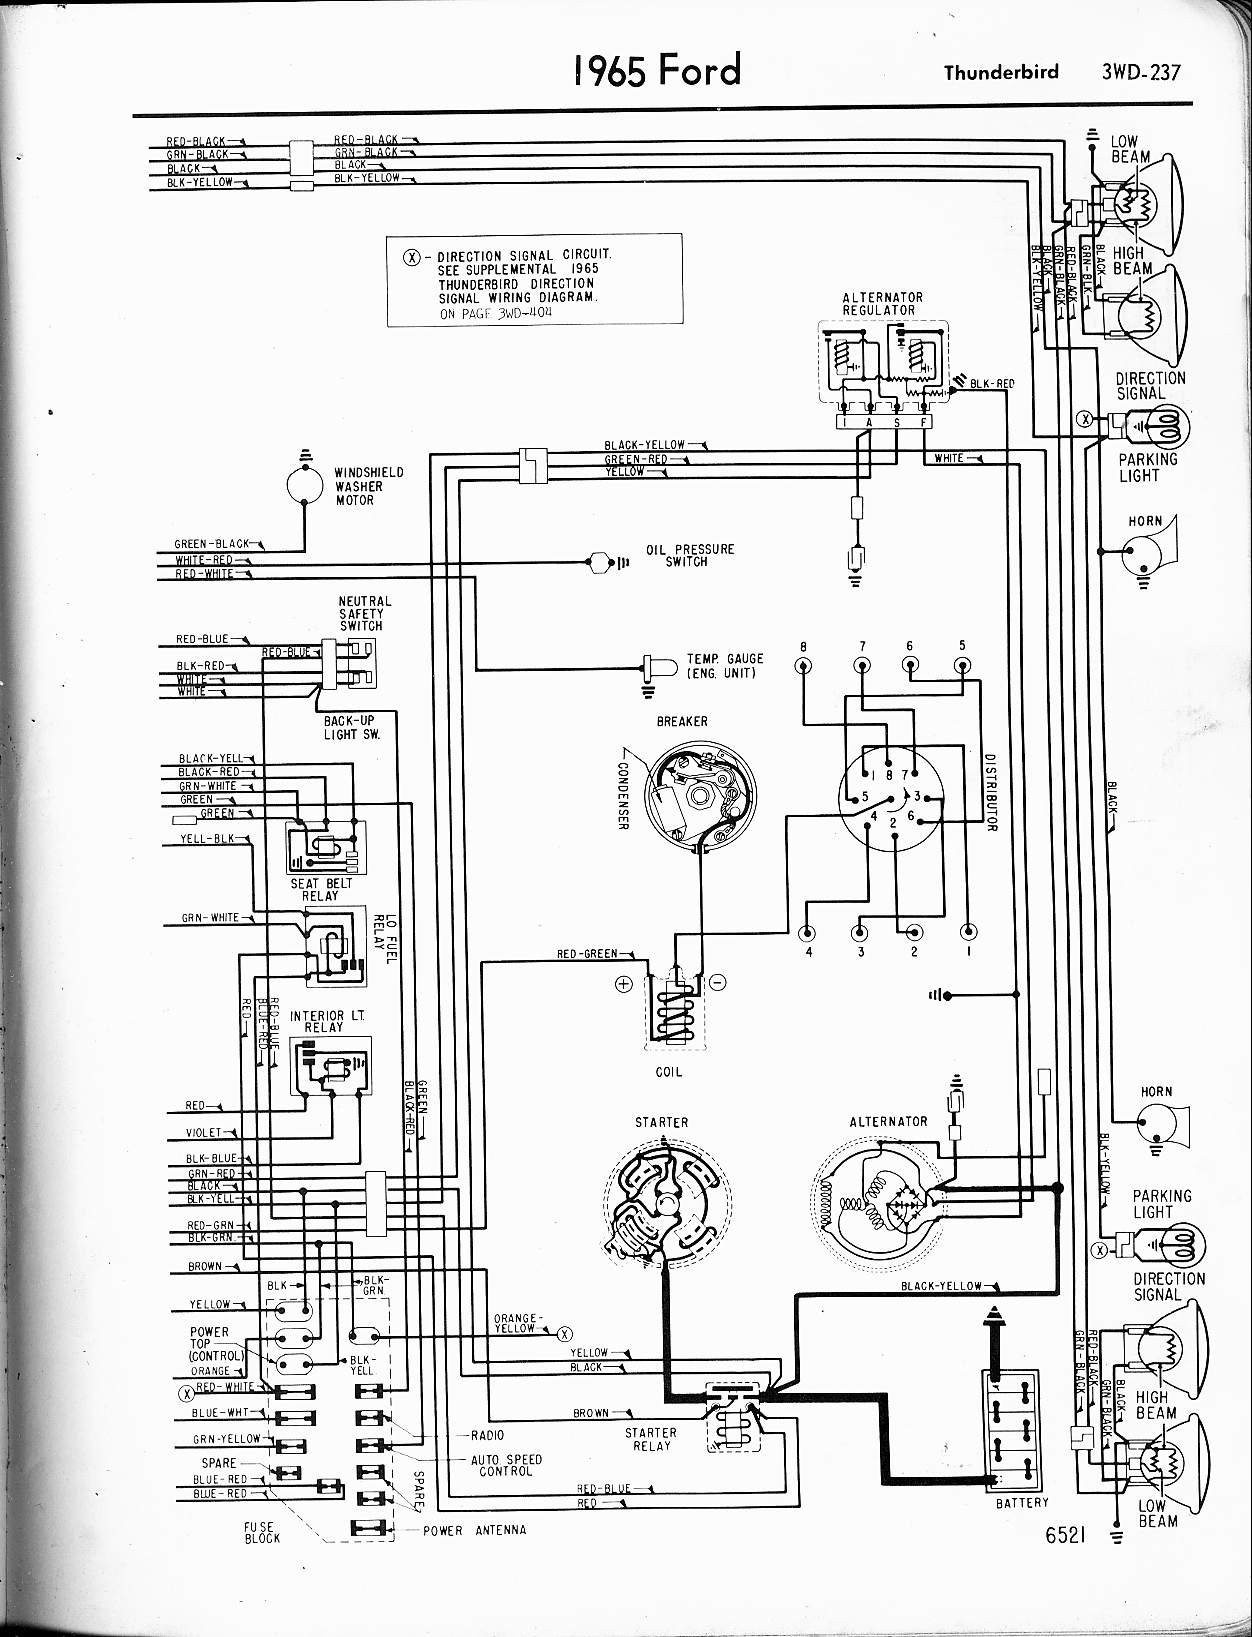 Starter Solenoid Wiring Diagram Elegant Image Cat Relay Mustang Best 1965 Thunderbird Diagrams Schematics Inspirational